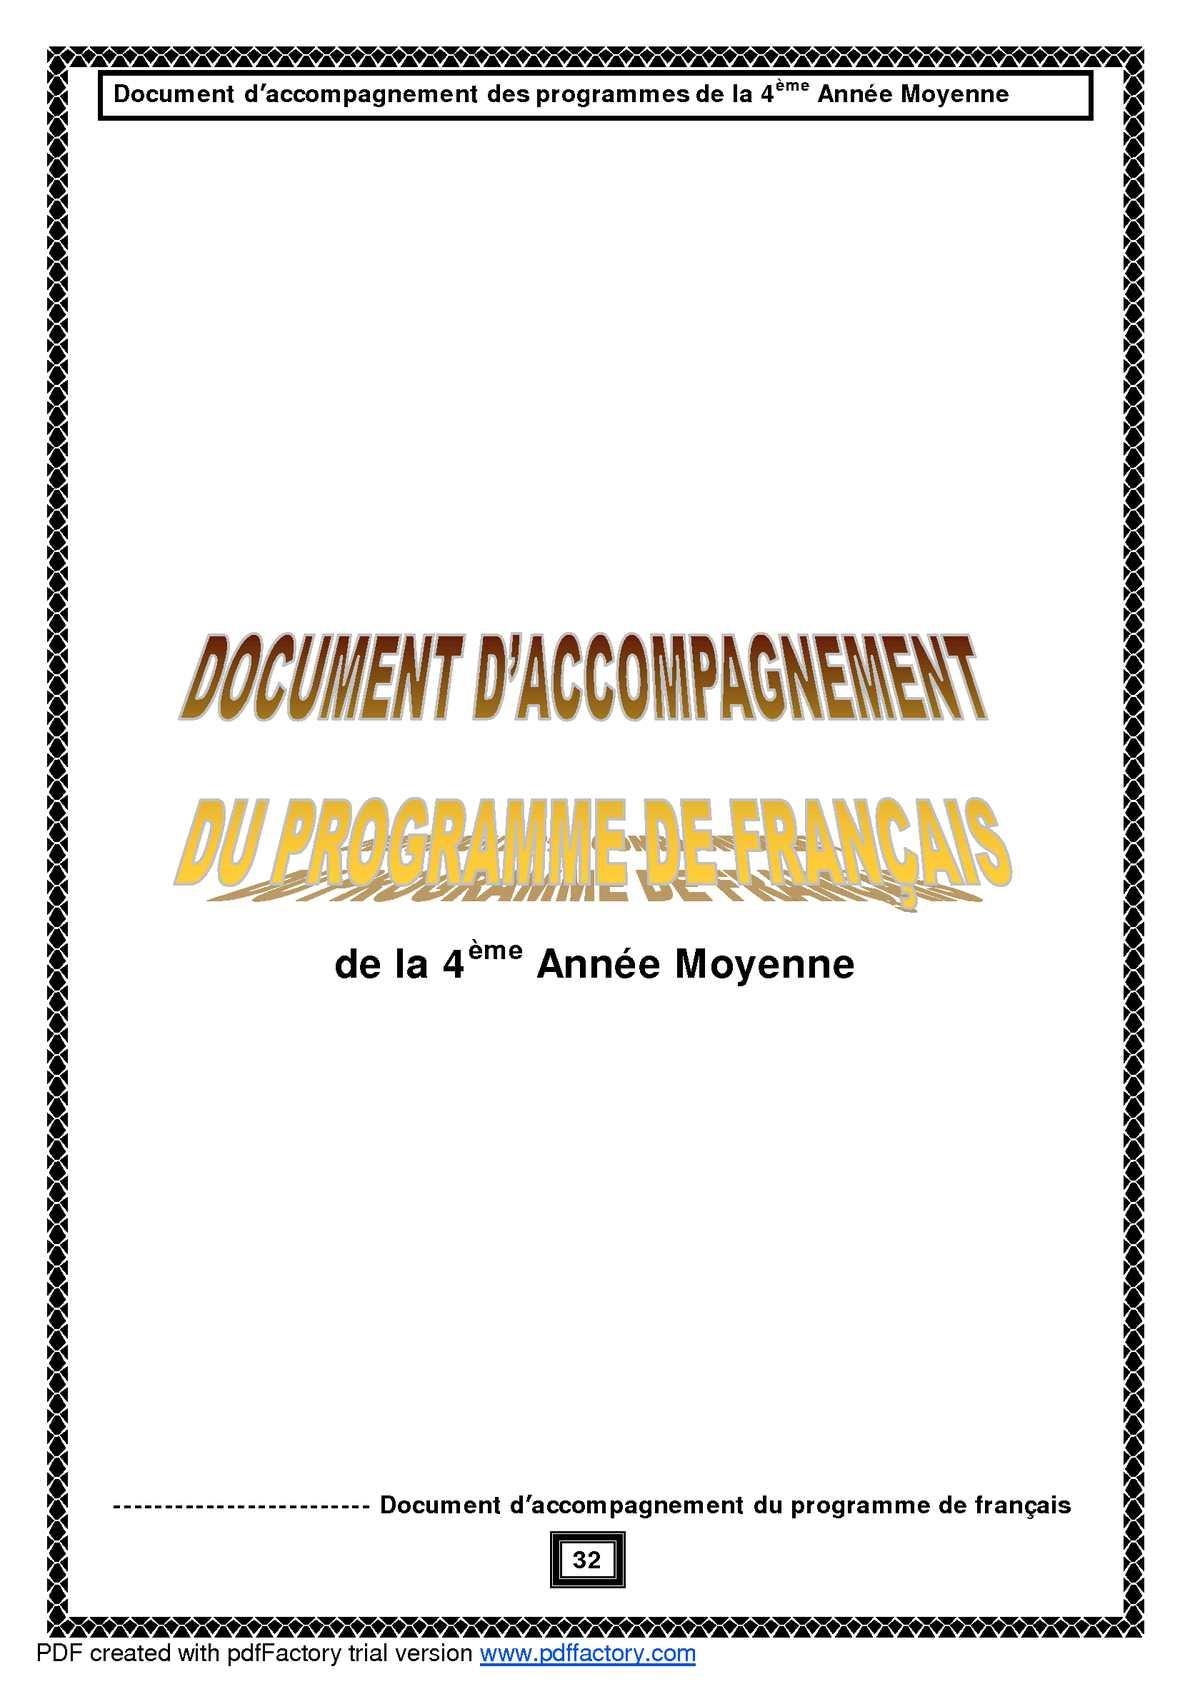 Calameo Doc Acc 1